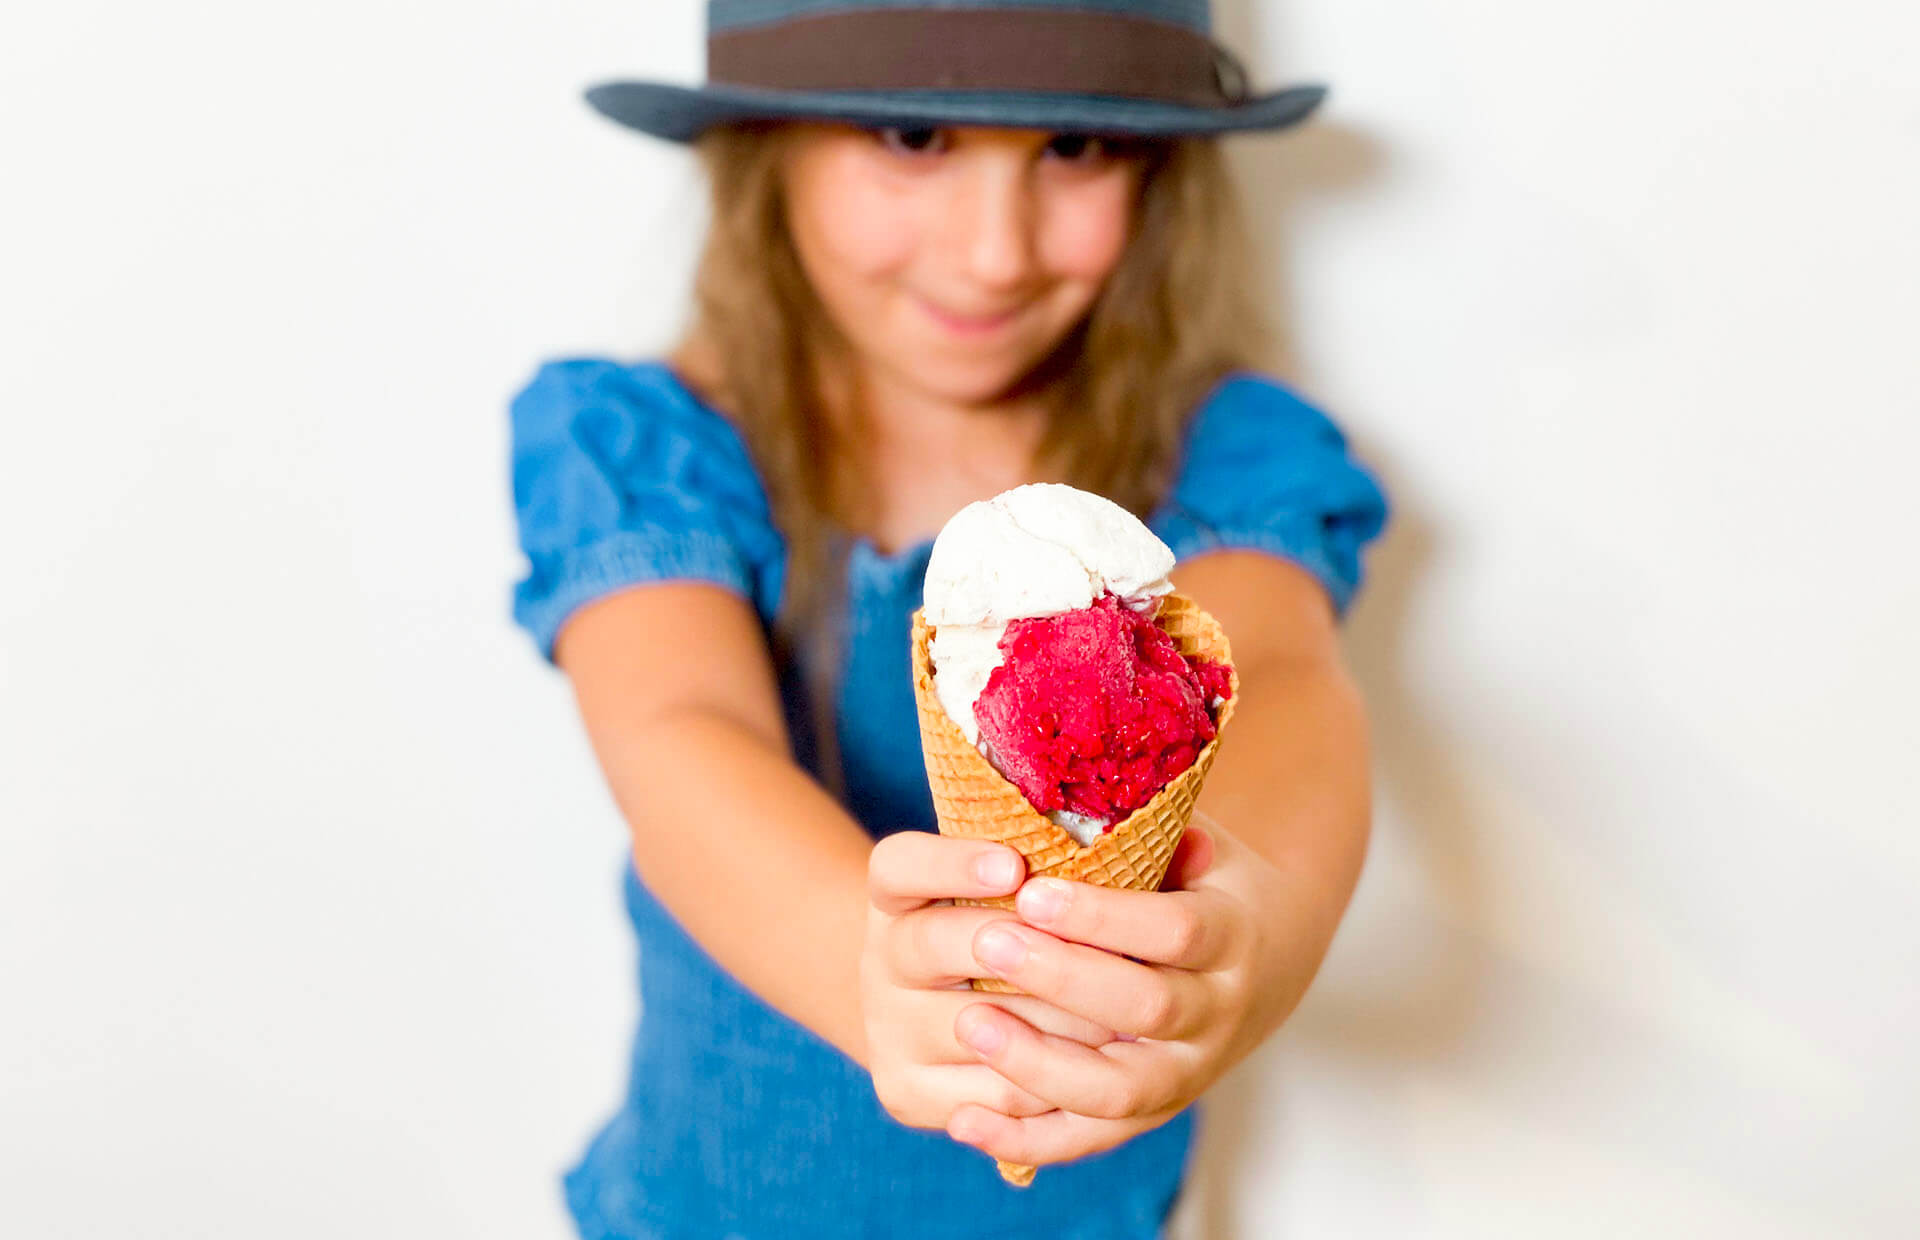 sladoled, klub zdravih navika, sladoled klub zdravih kavika, kzn, sladoled kzn, domaci sladoled, kremasti sladoled od banana, banana sladoled, malina sladoled, sladoled od malina, sladoled na domaci nacin, desert, iceberg salat centar